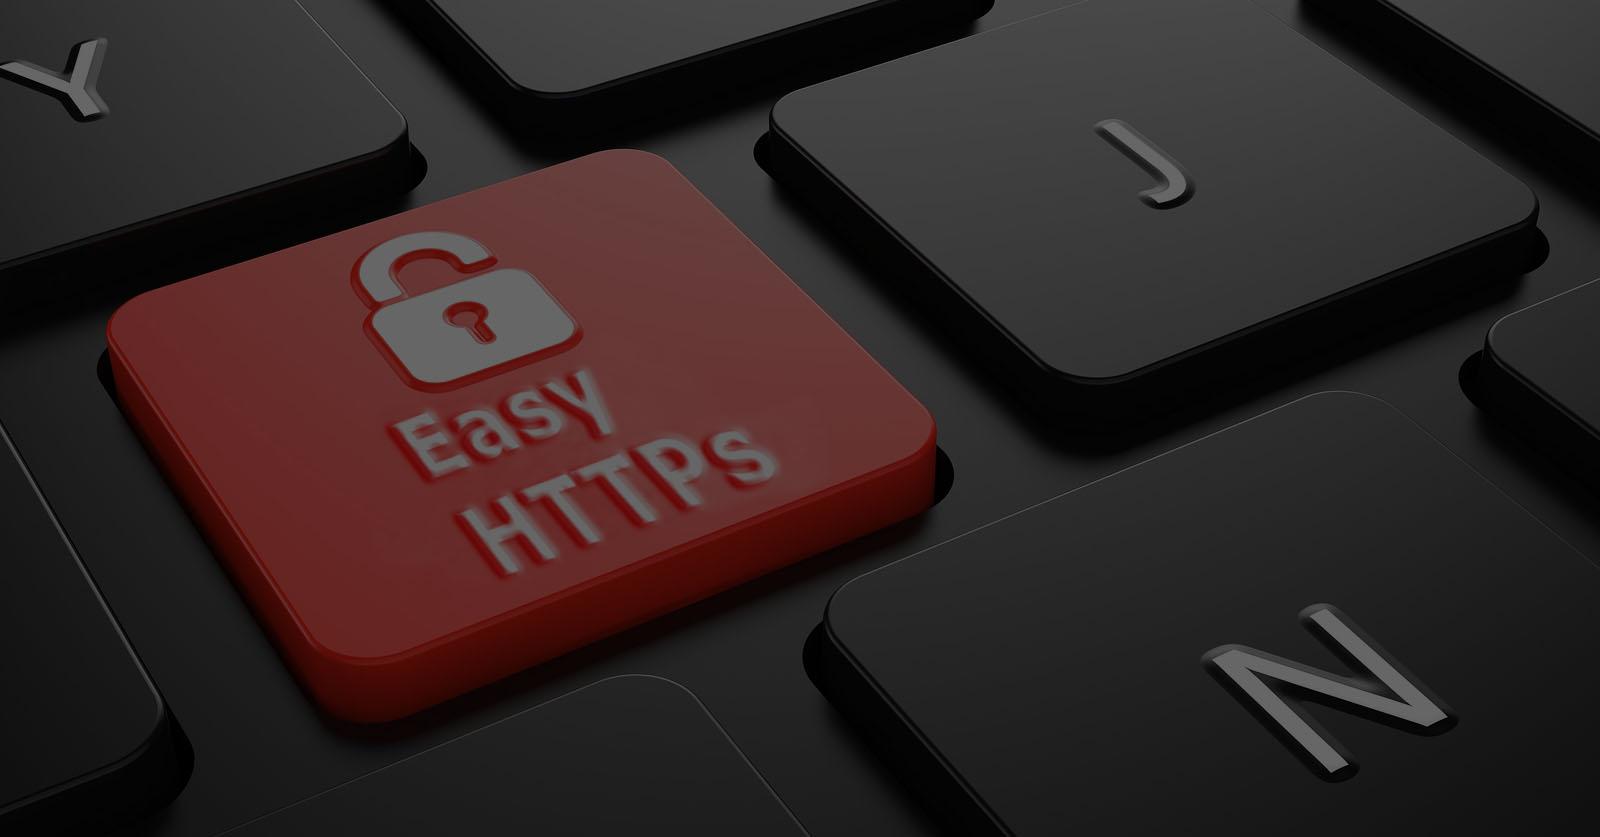 Lets encryptssl certificatehttps certificatequick apply get lets encrypt sslhttps certificate is simplest 1betcityfo Images